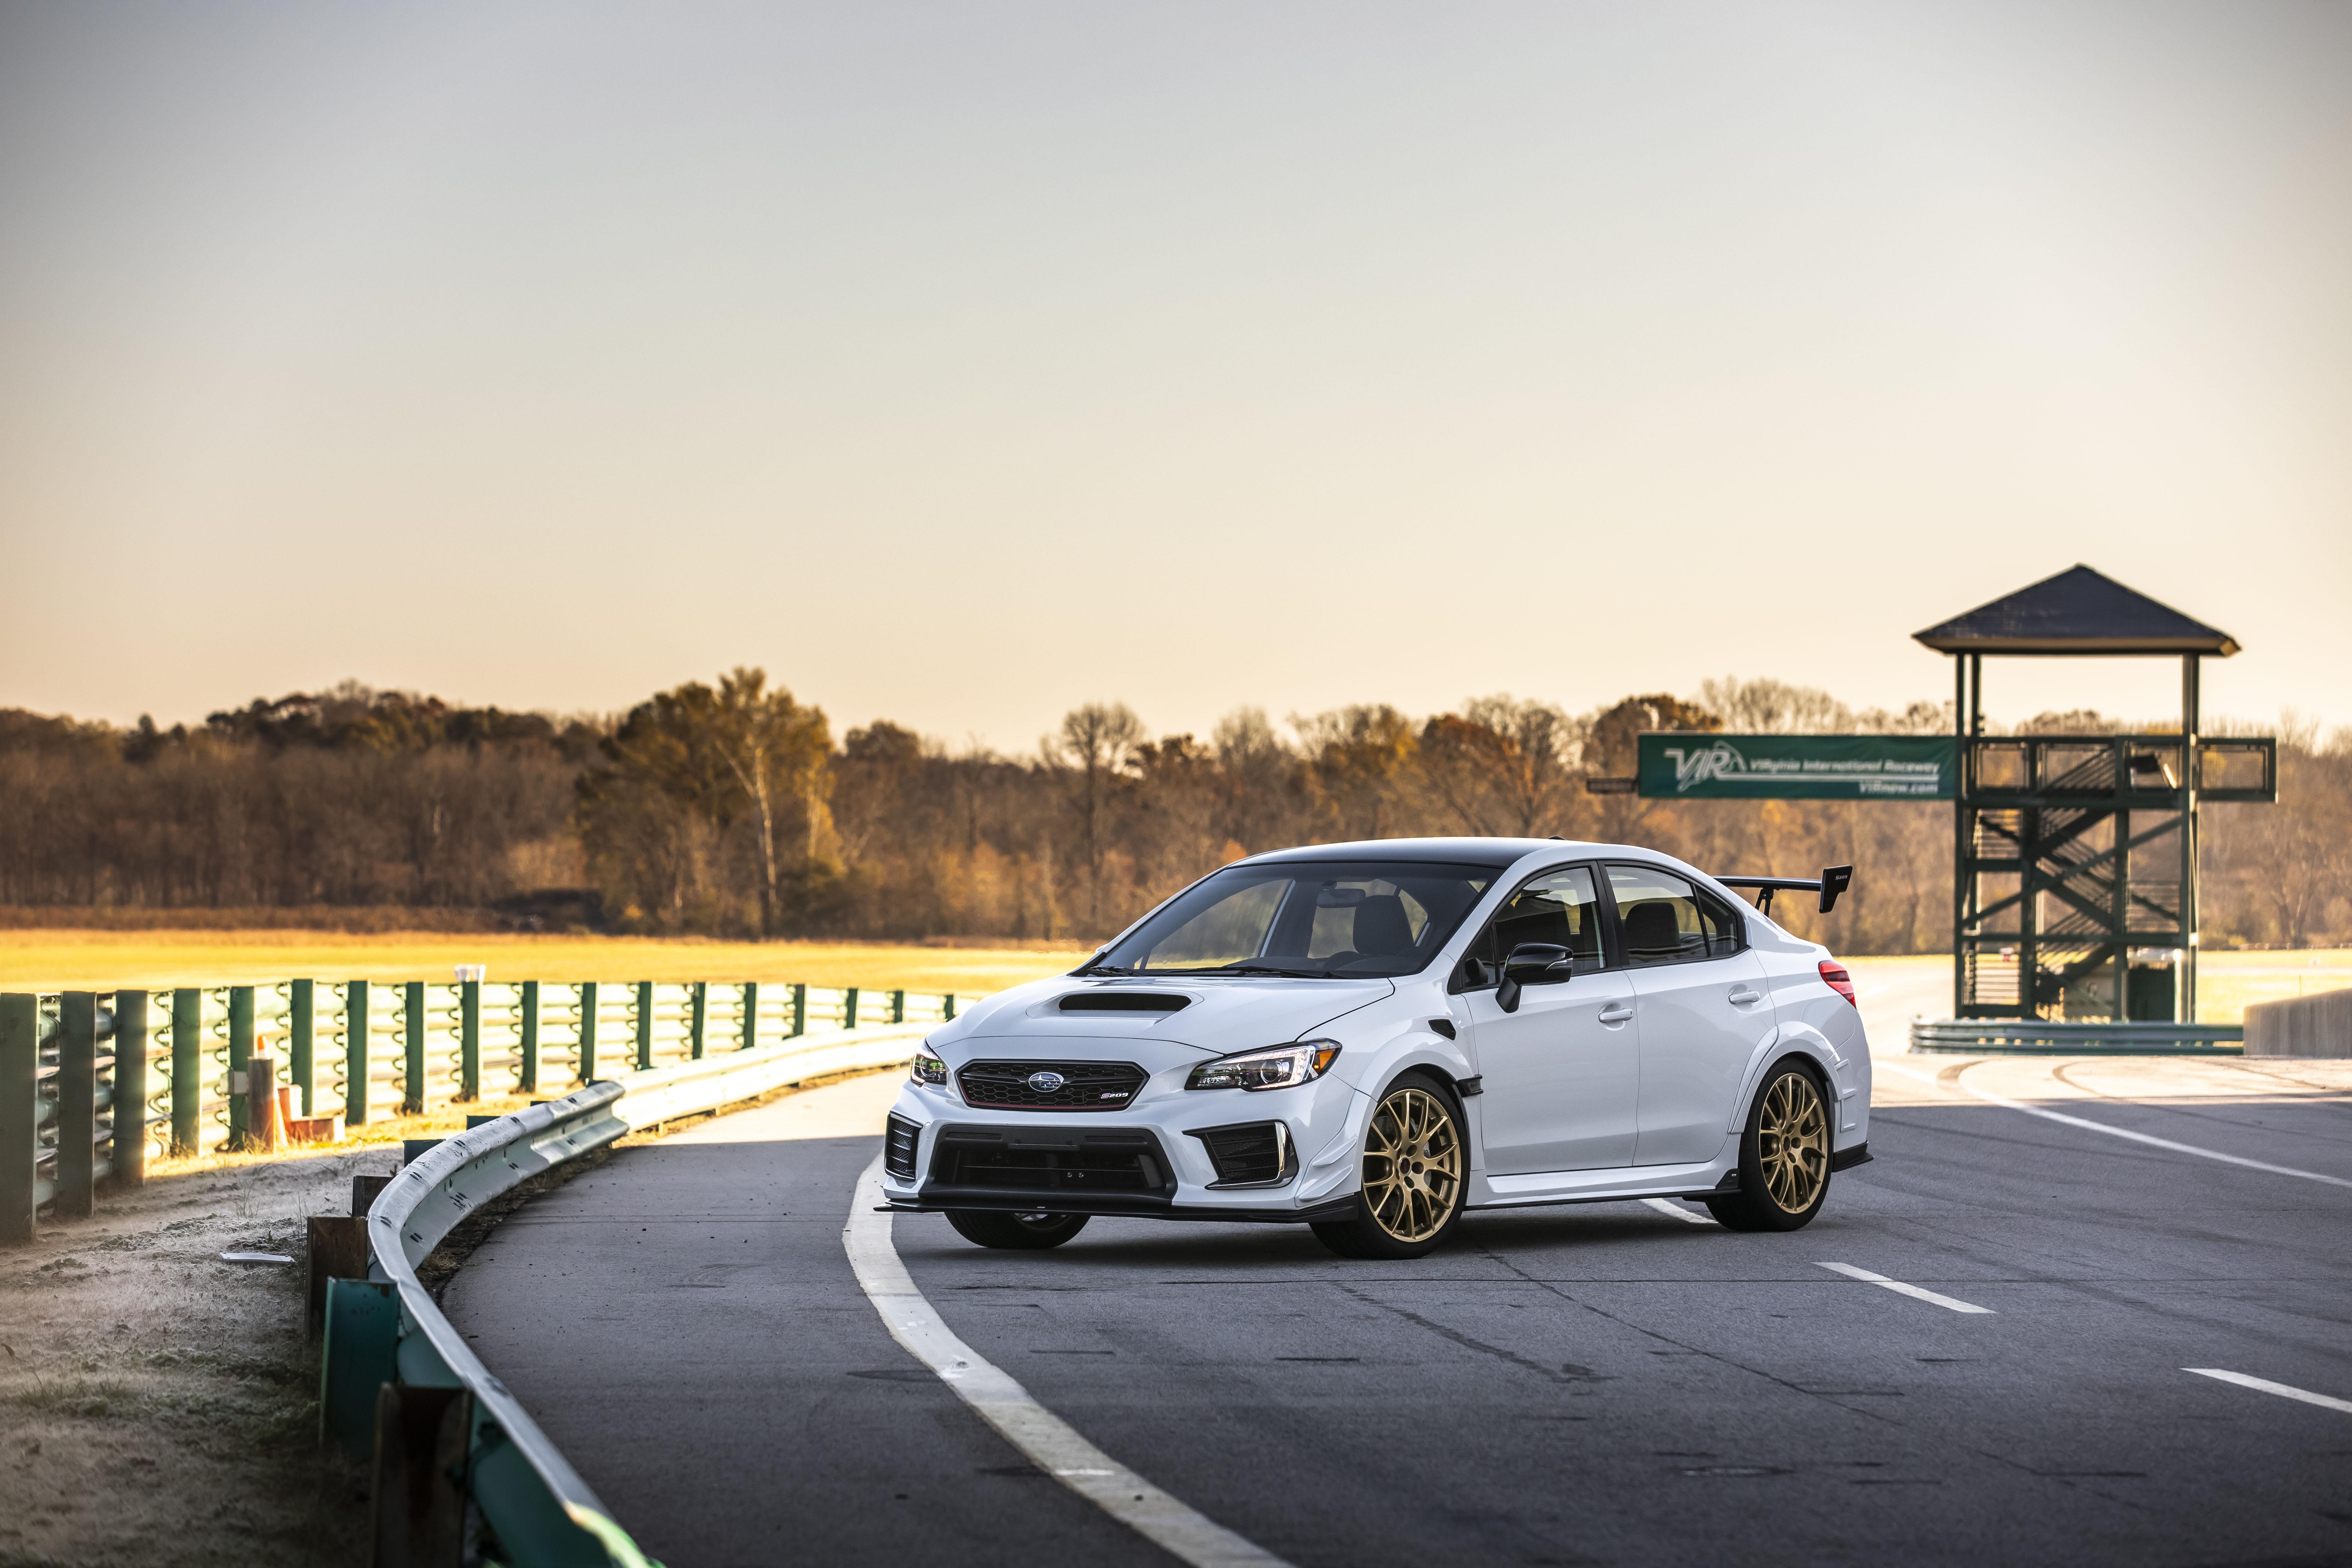 2020 Subaru WRX STI S209: 341 HP, Race-Ready Upgrades, and Just 200